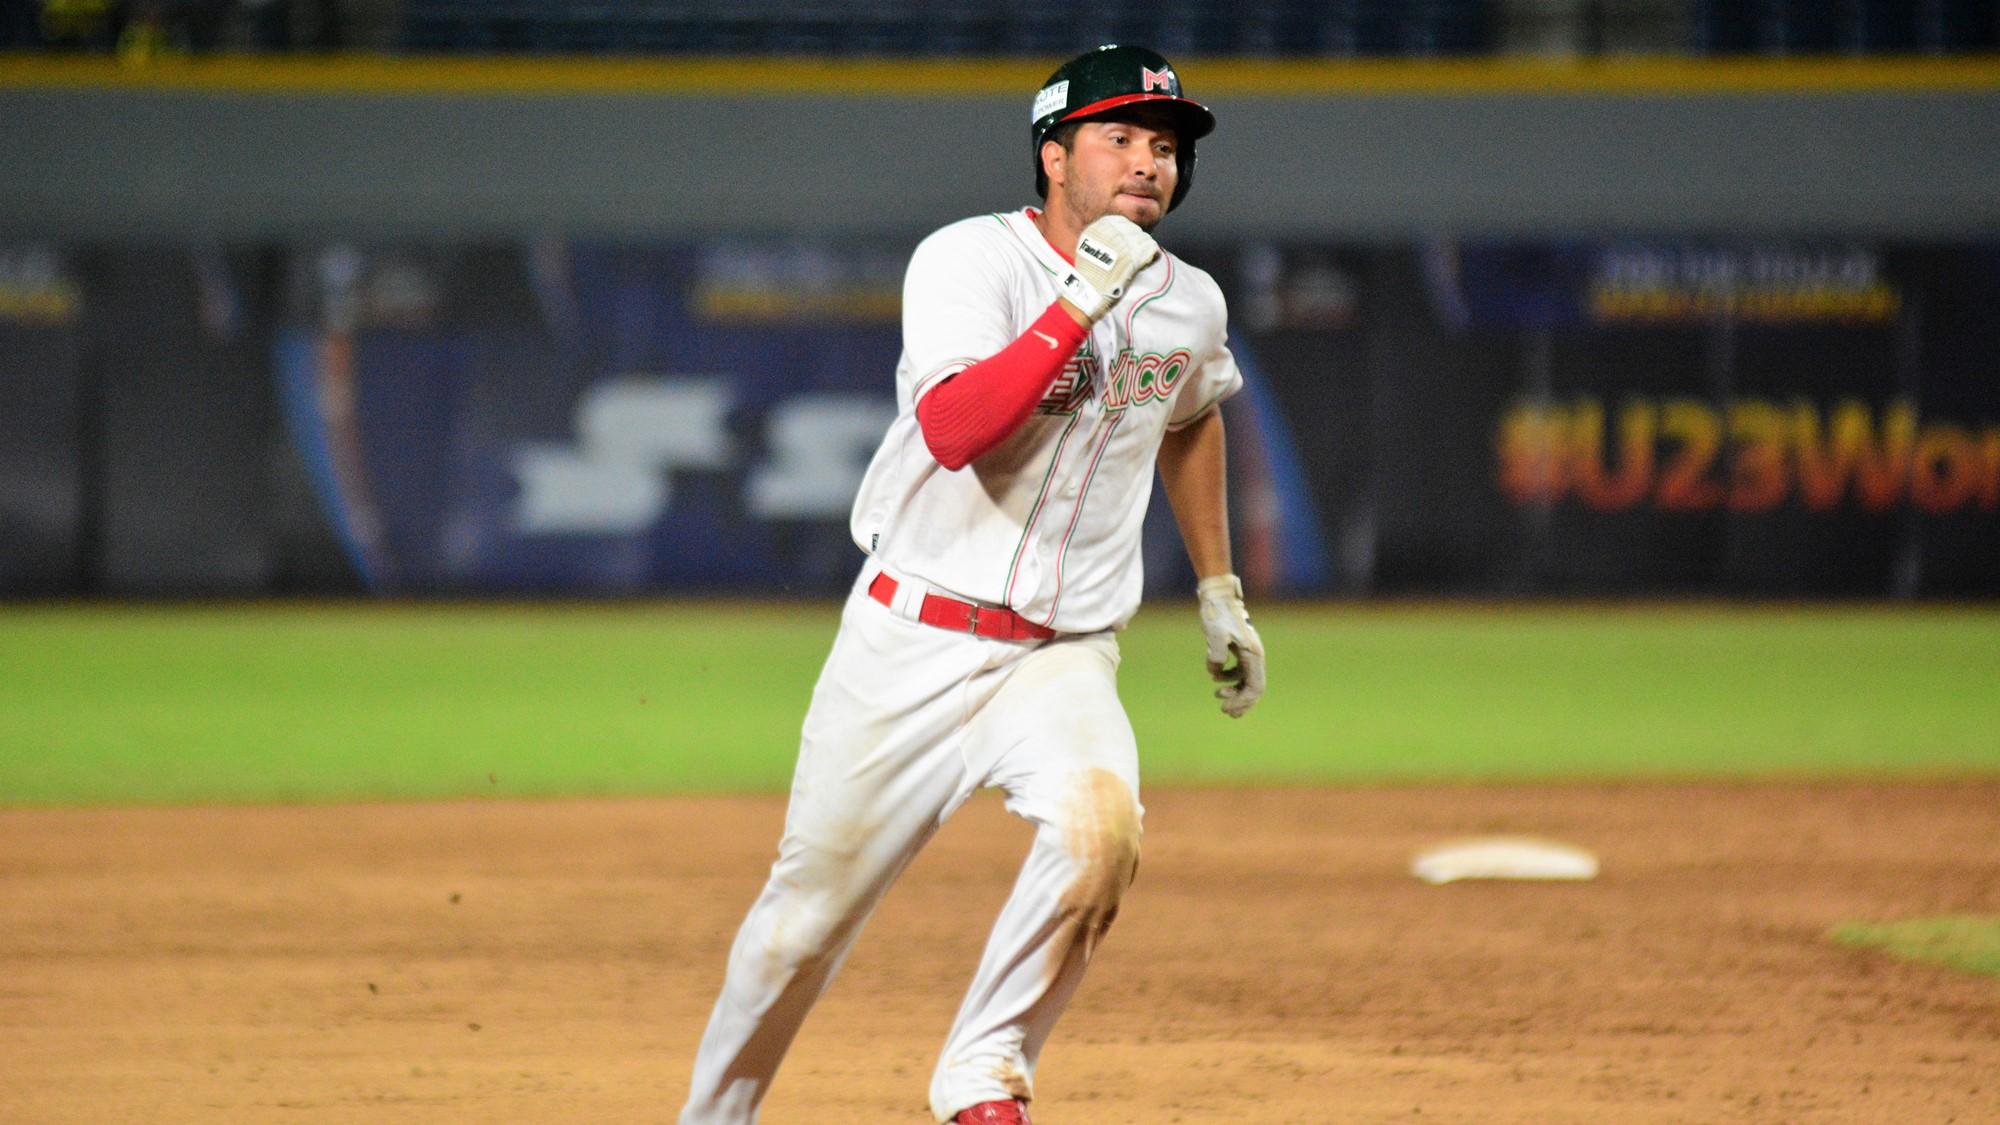 Walter Higuera heads home to score the winning run